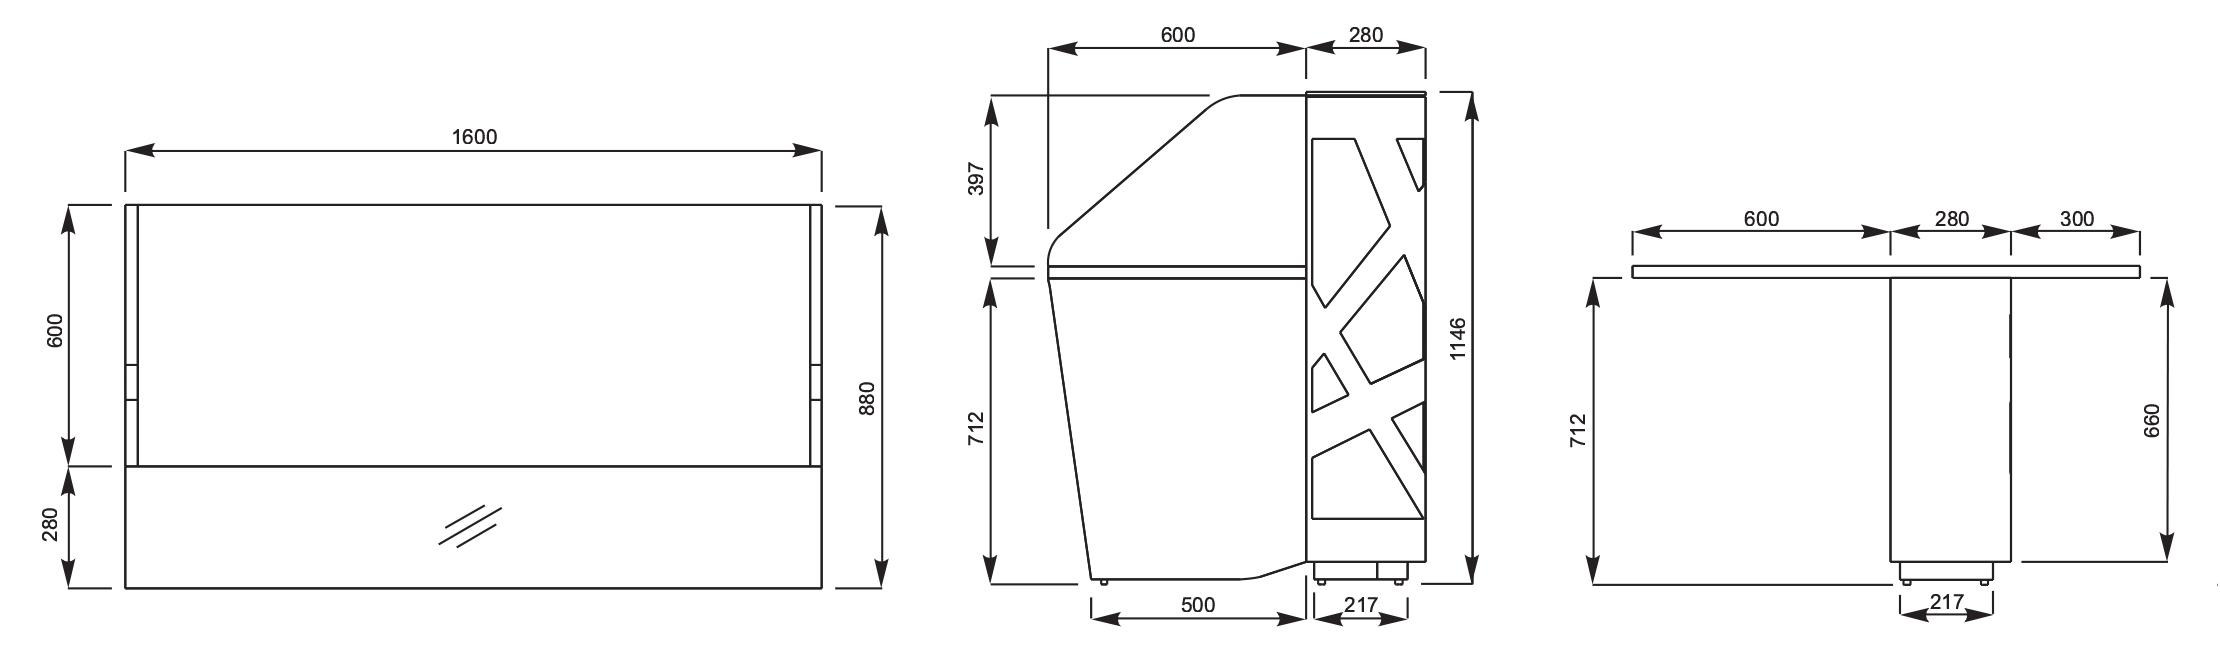 Reception desk dimension homezanin reception desk dimension - Models And Sizes Cityoffice_recepcijas_izmeri_zigzag Zigzag Reception Desks